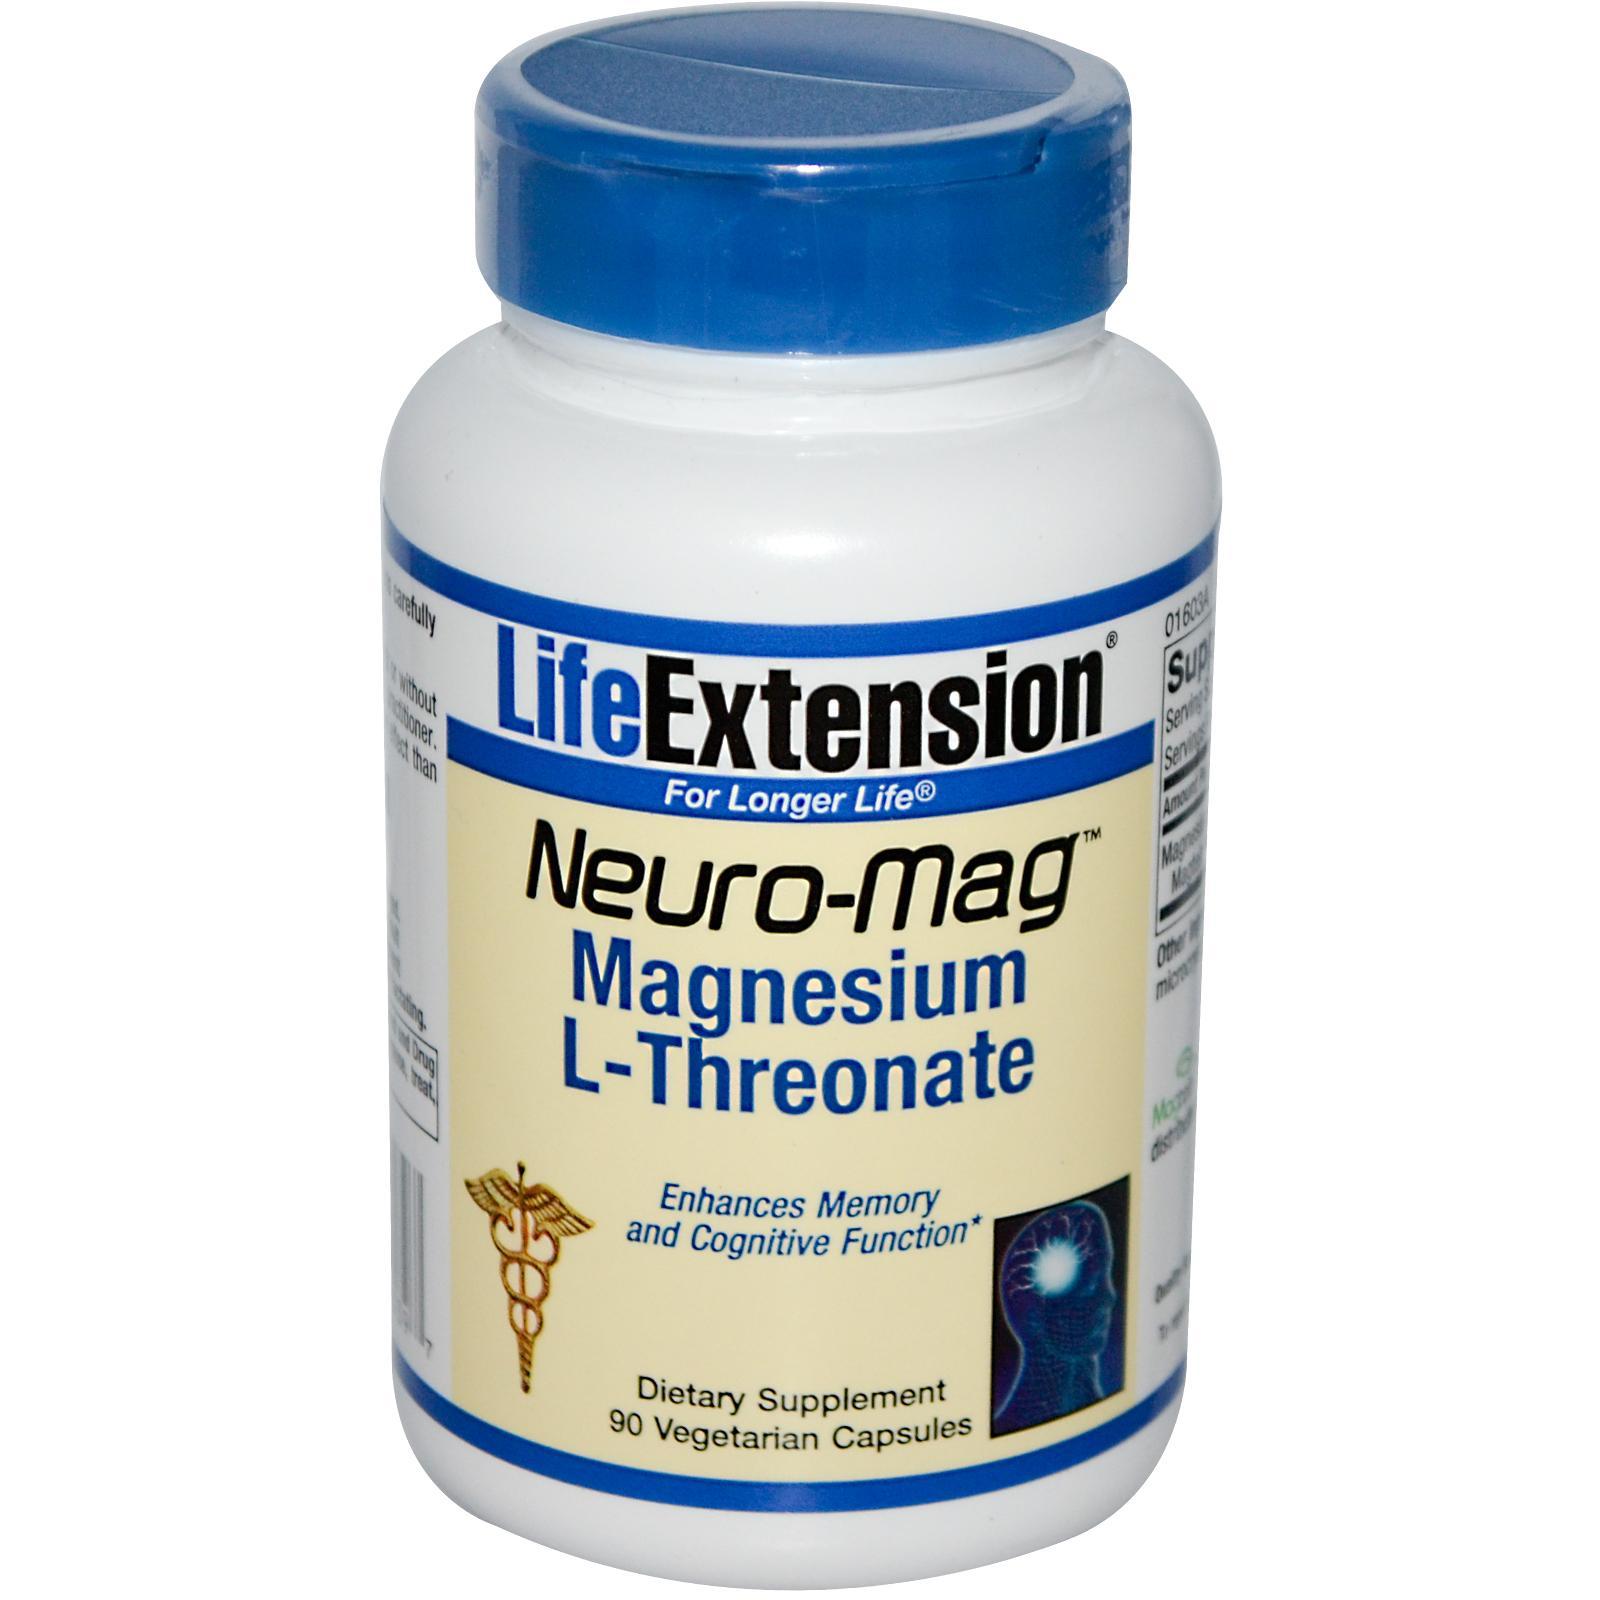 Neuro-Mag Magnesium L-Threonate Review